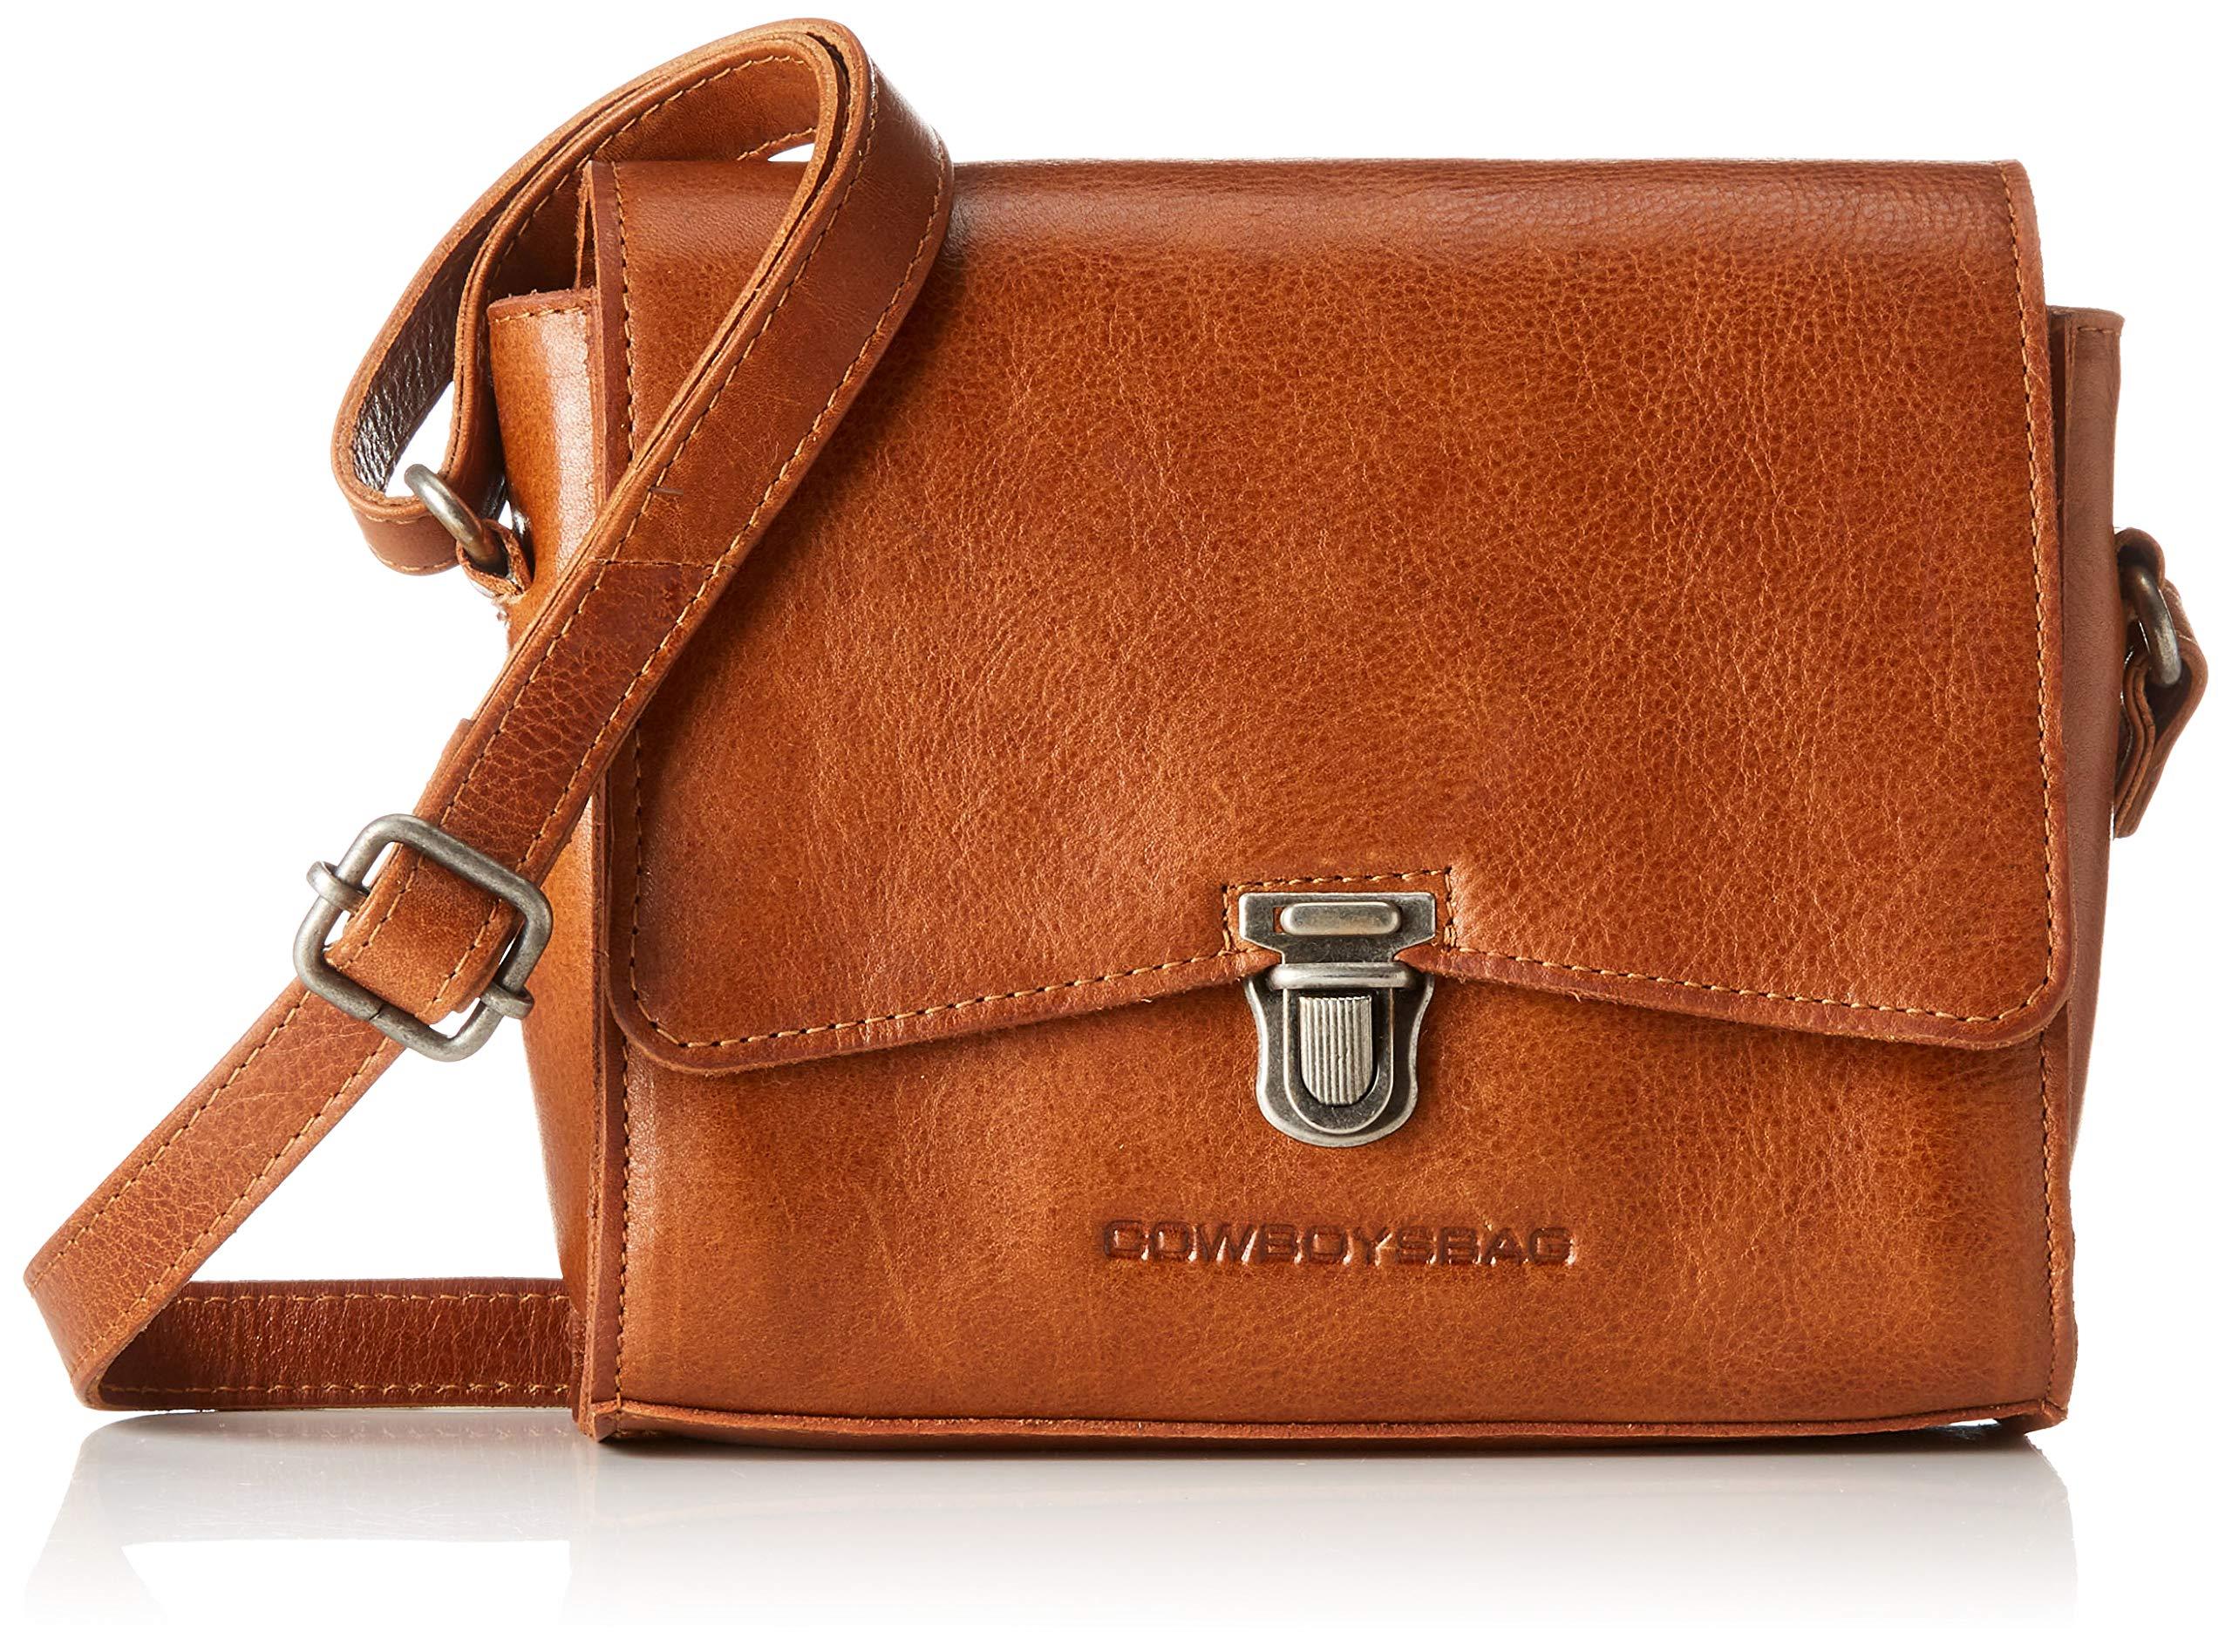 H Bandoulière T X FemmeMarron000380Juicy Cowboysbag Bag Cmb Tan7x13x19 RoweSacs sthdrQ